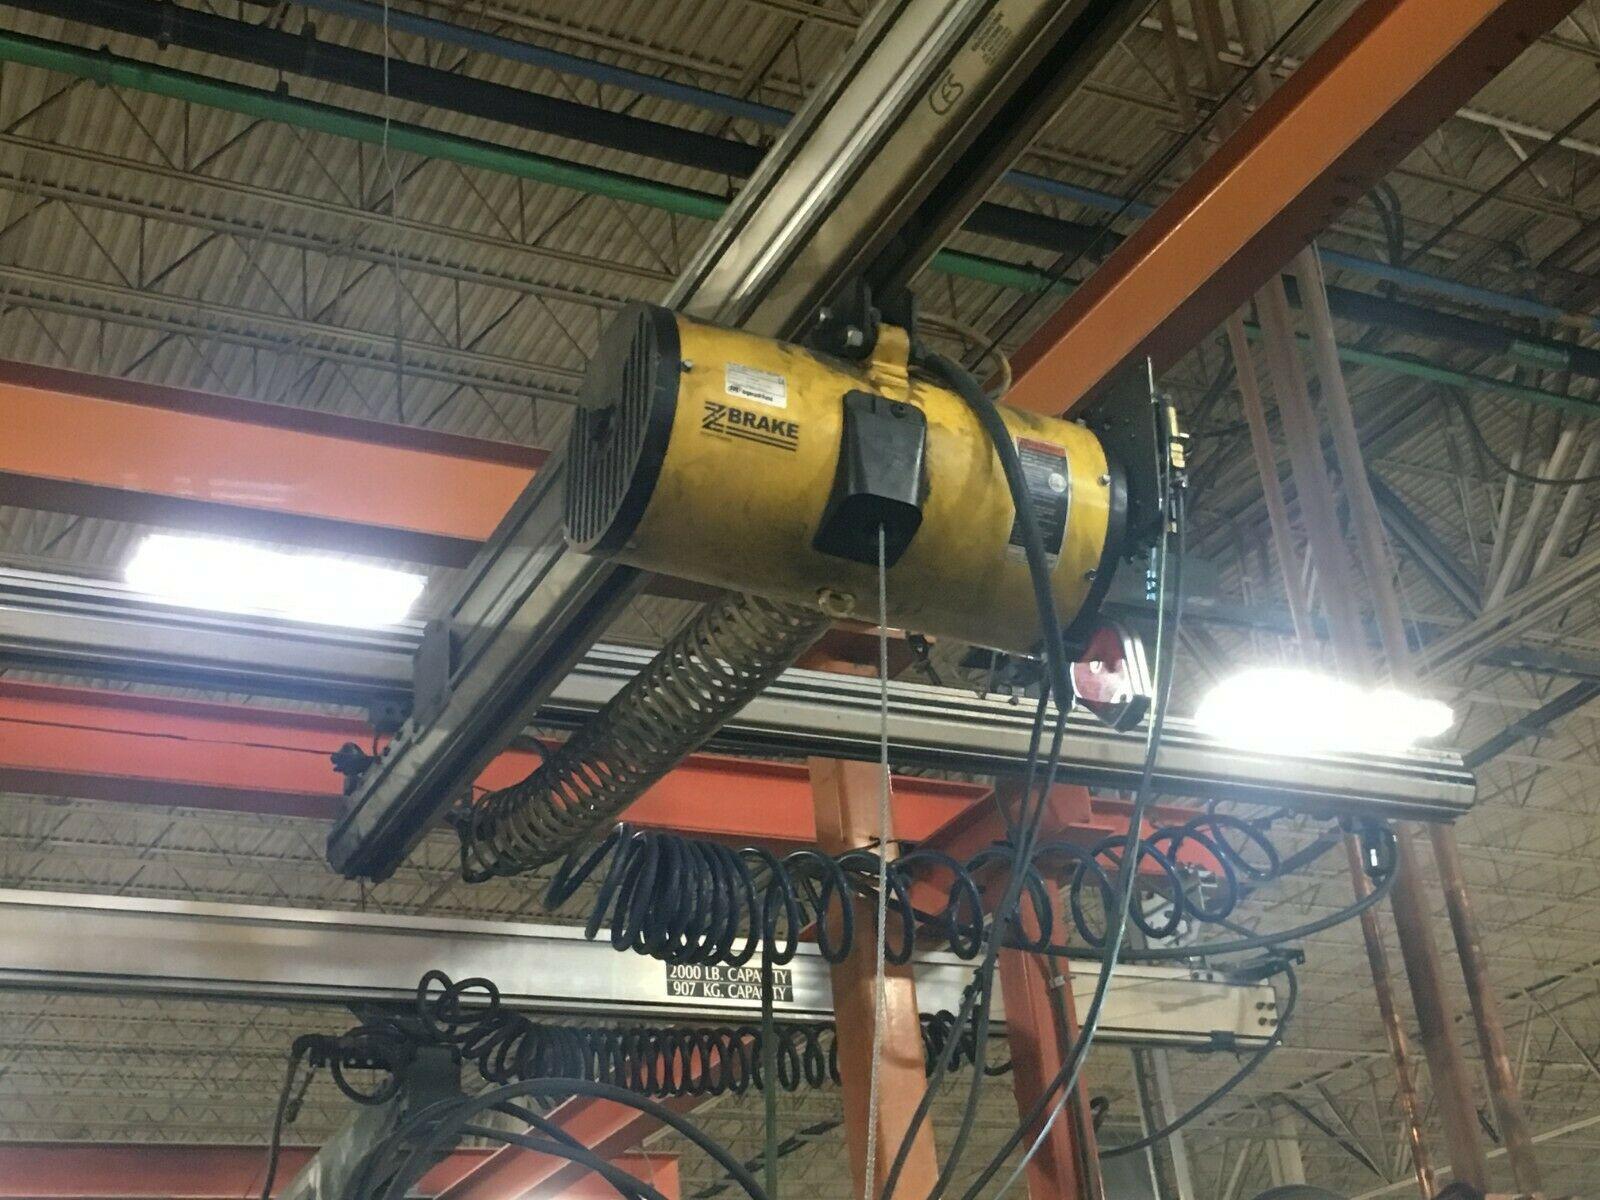 Lot 41 - 880 lb Free Standing Bridge Crane w/ Air Hoist